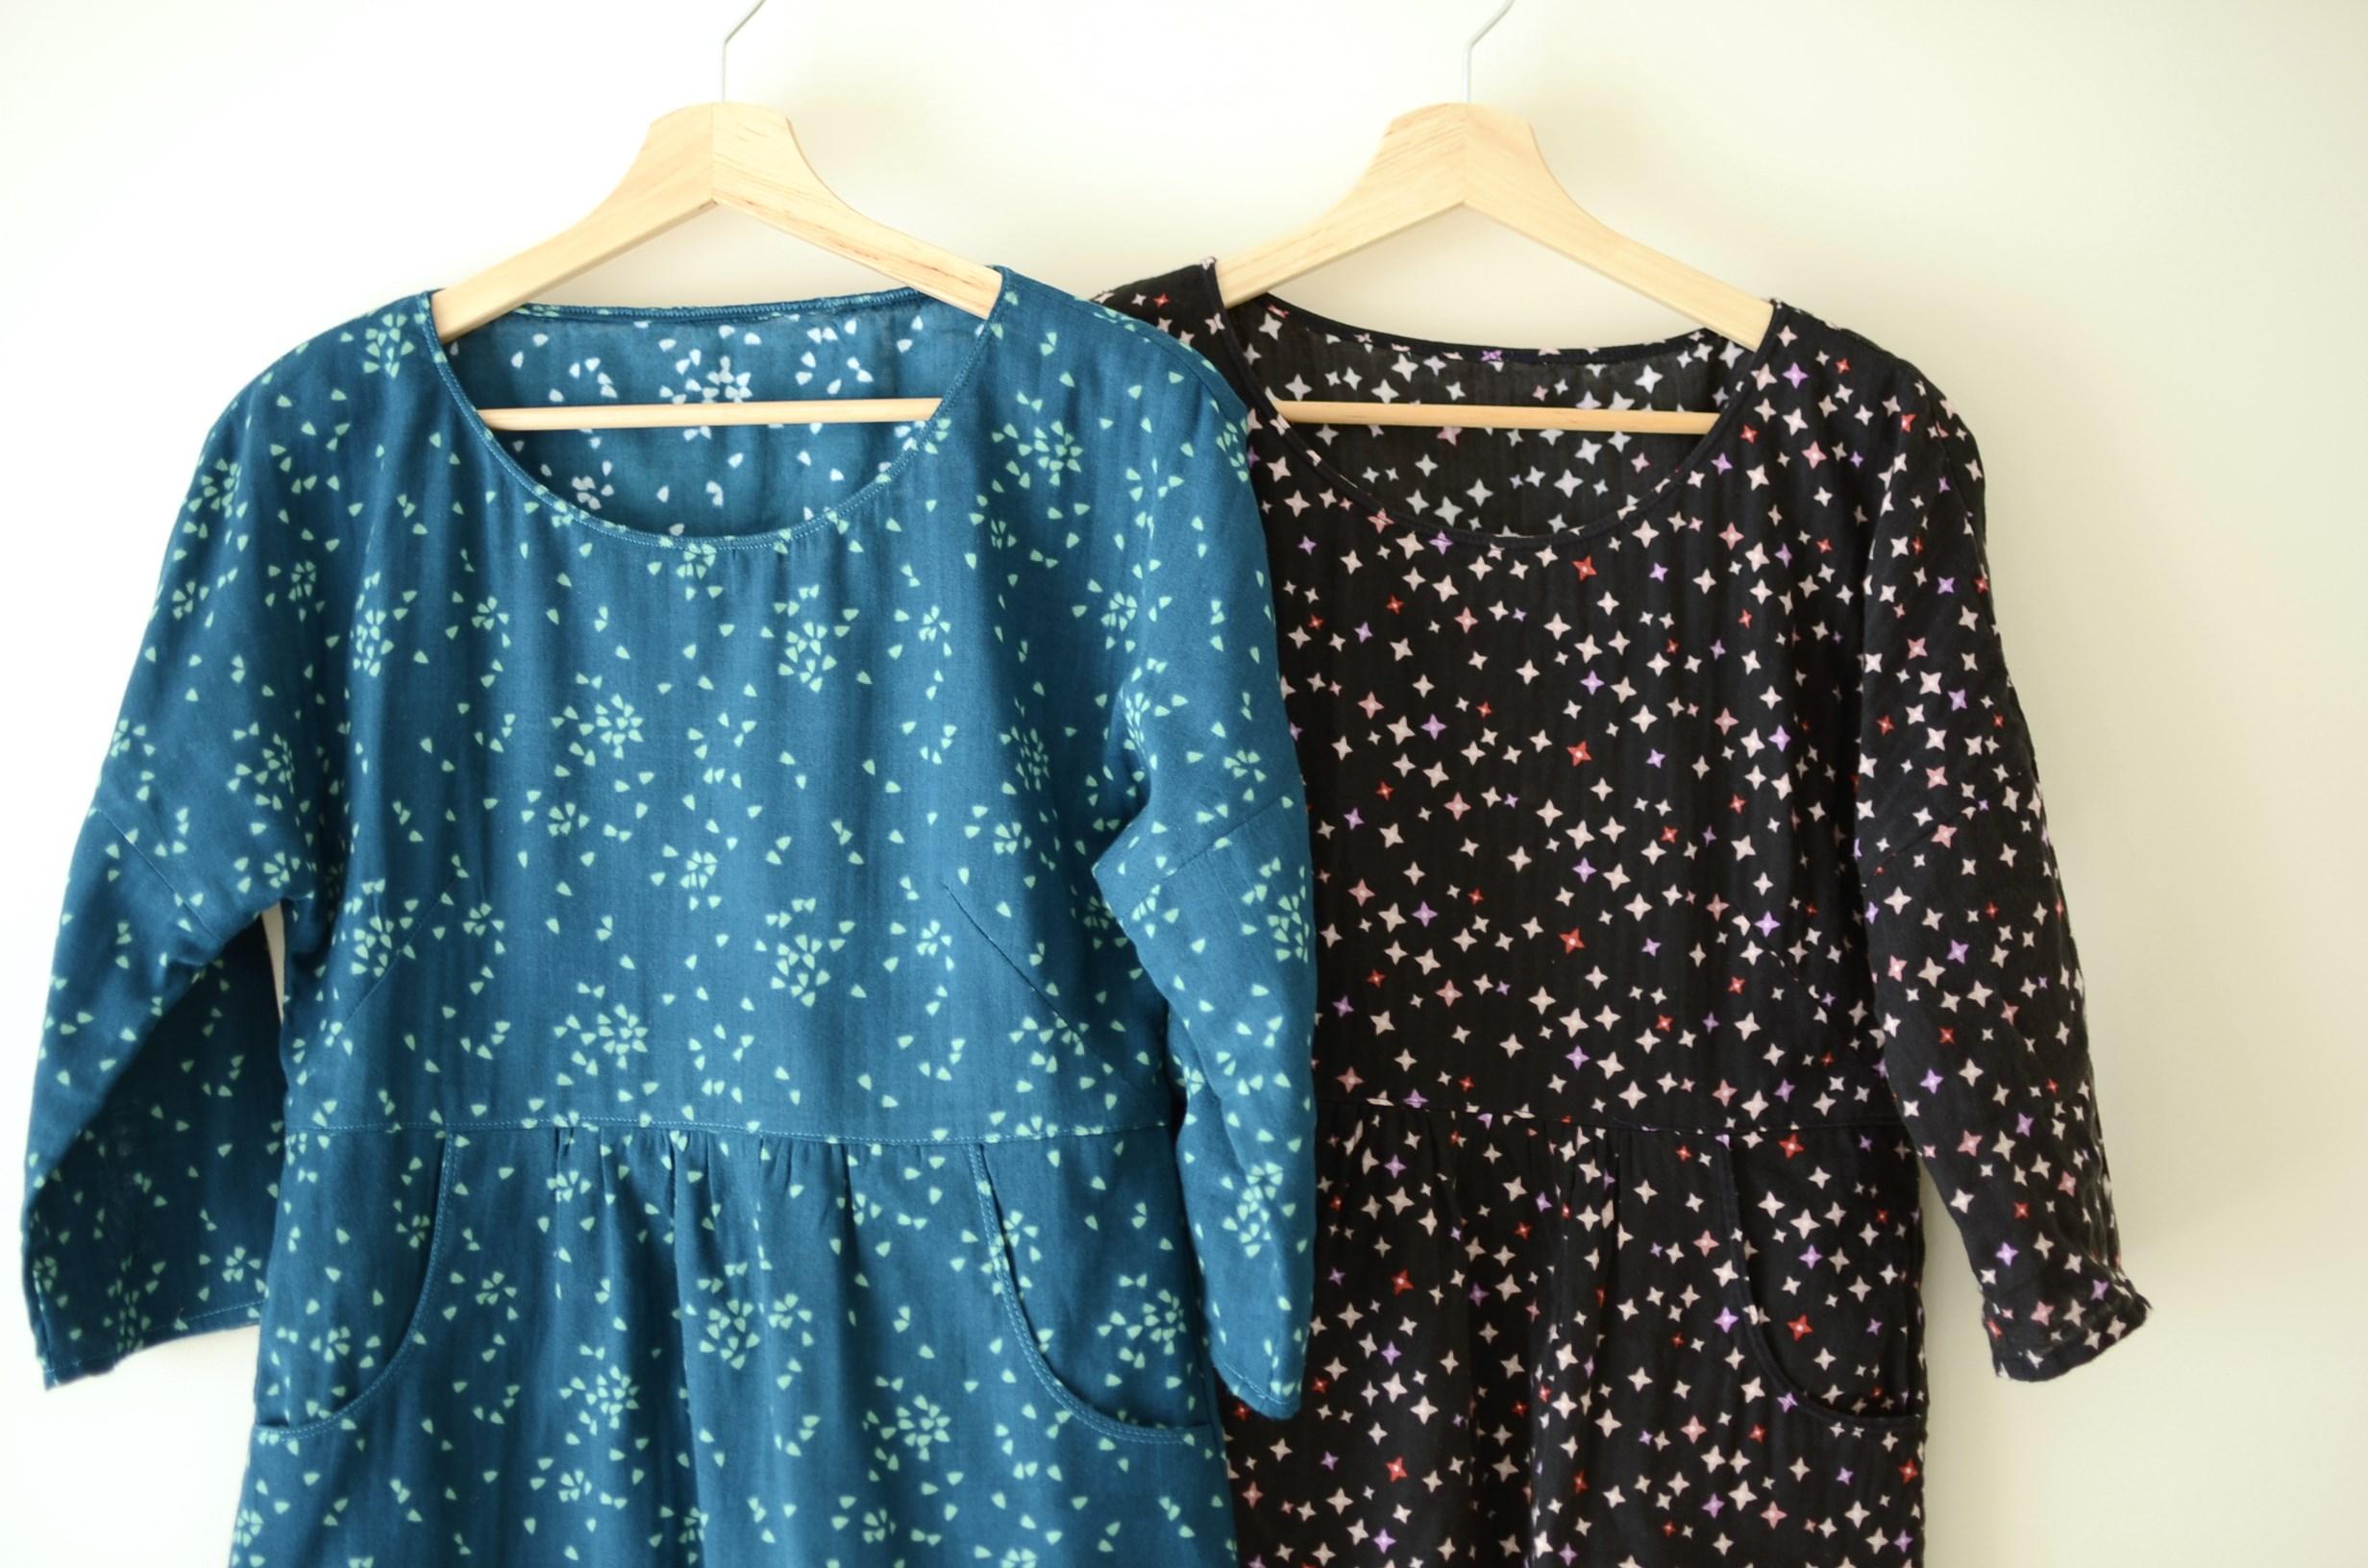 comfortstitching: dressmaking